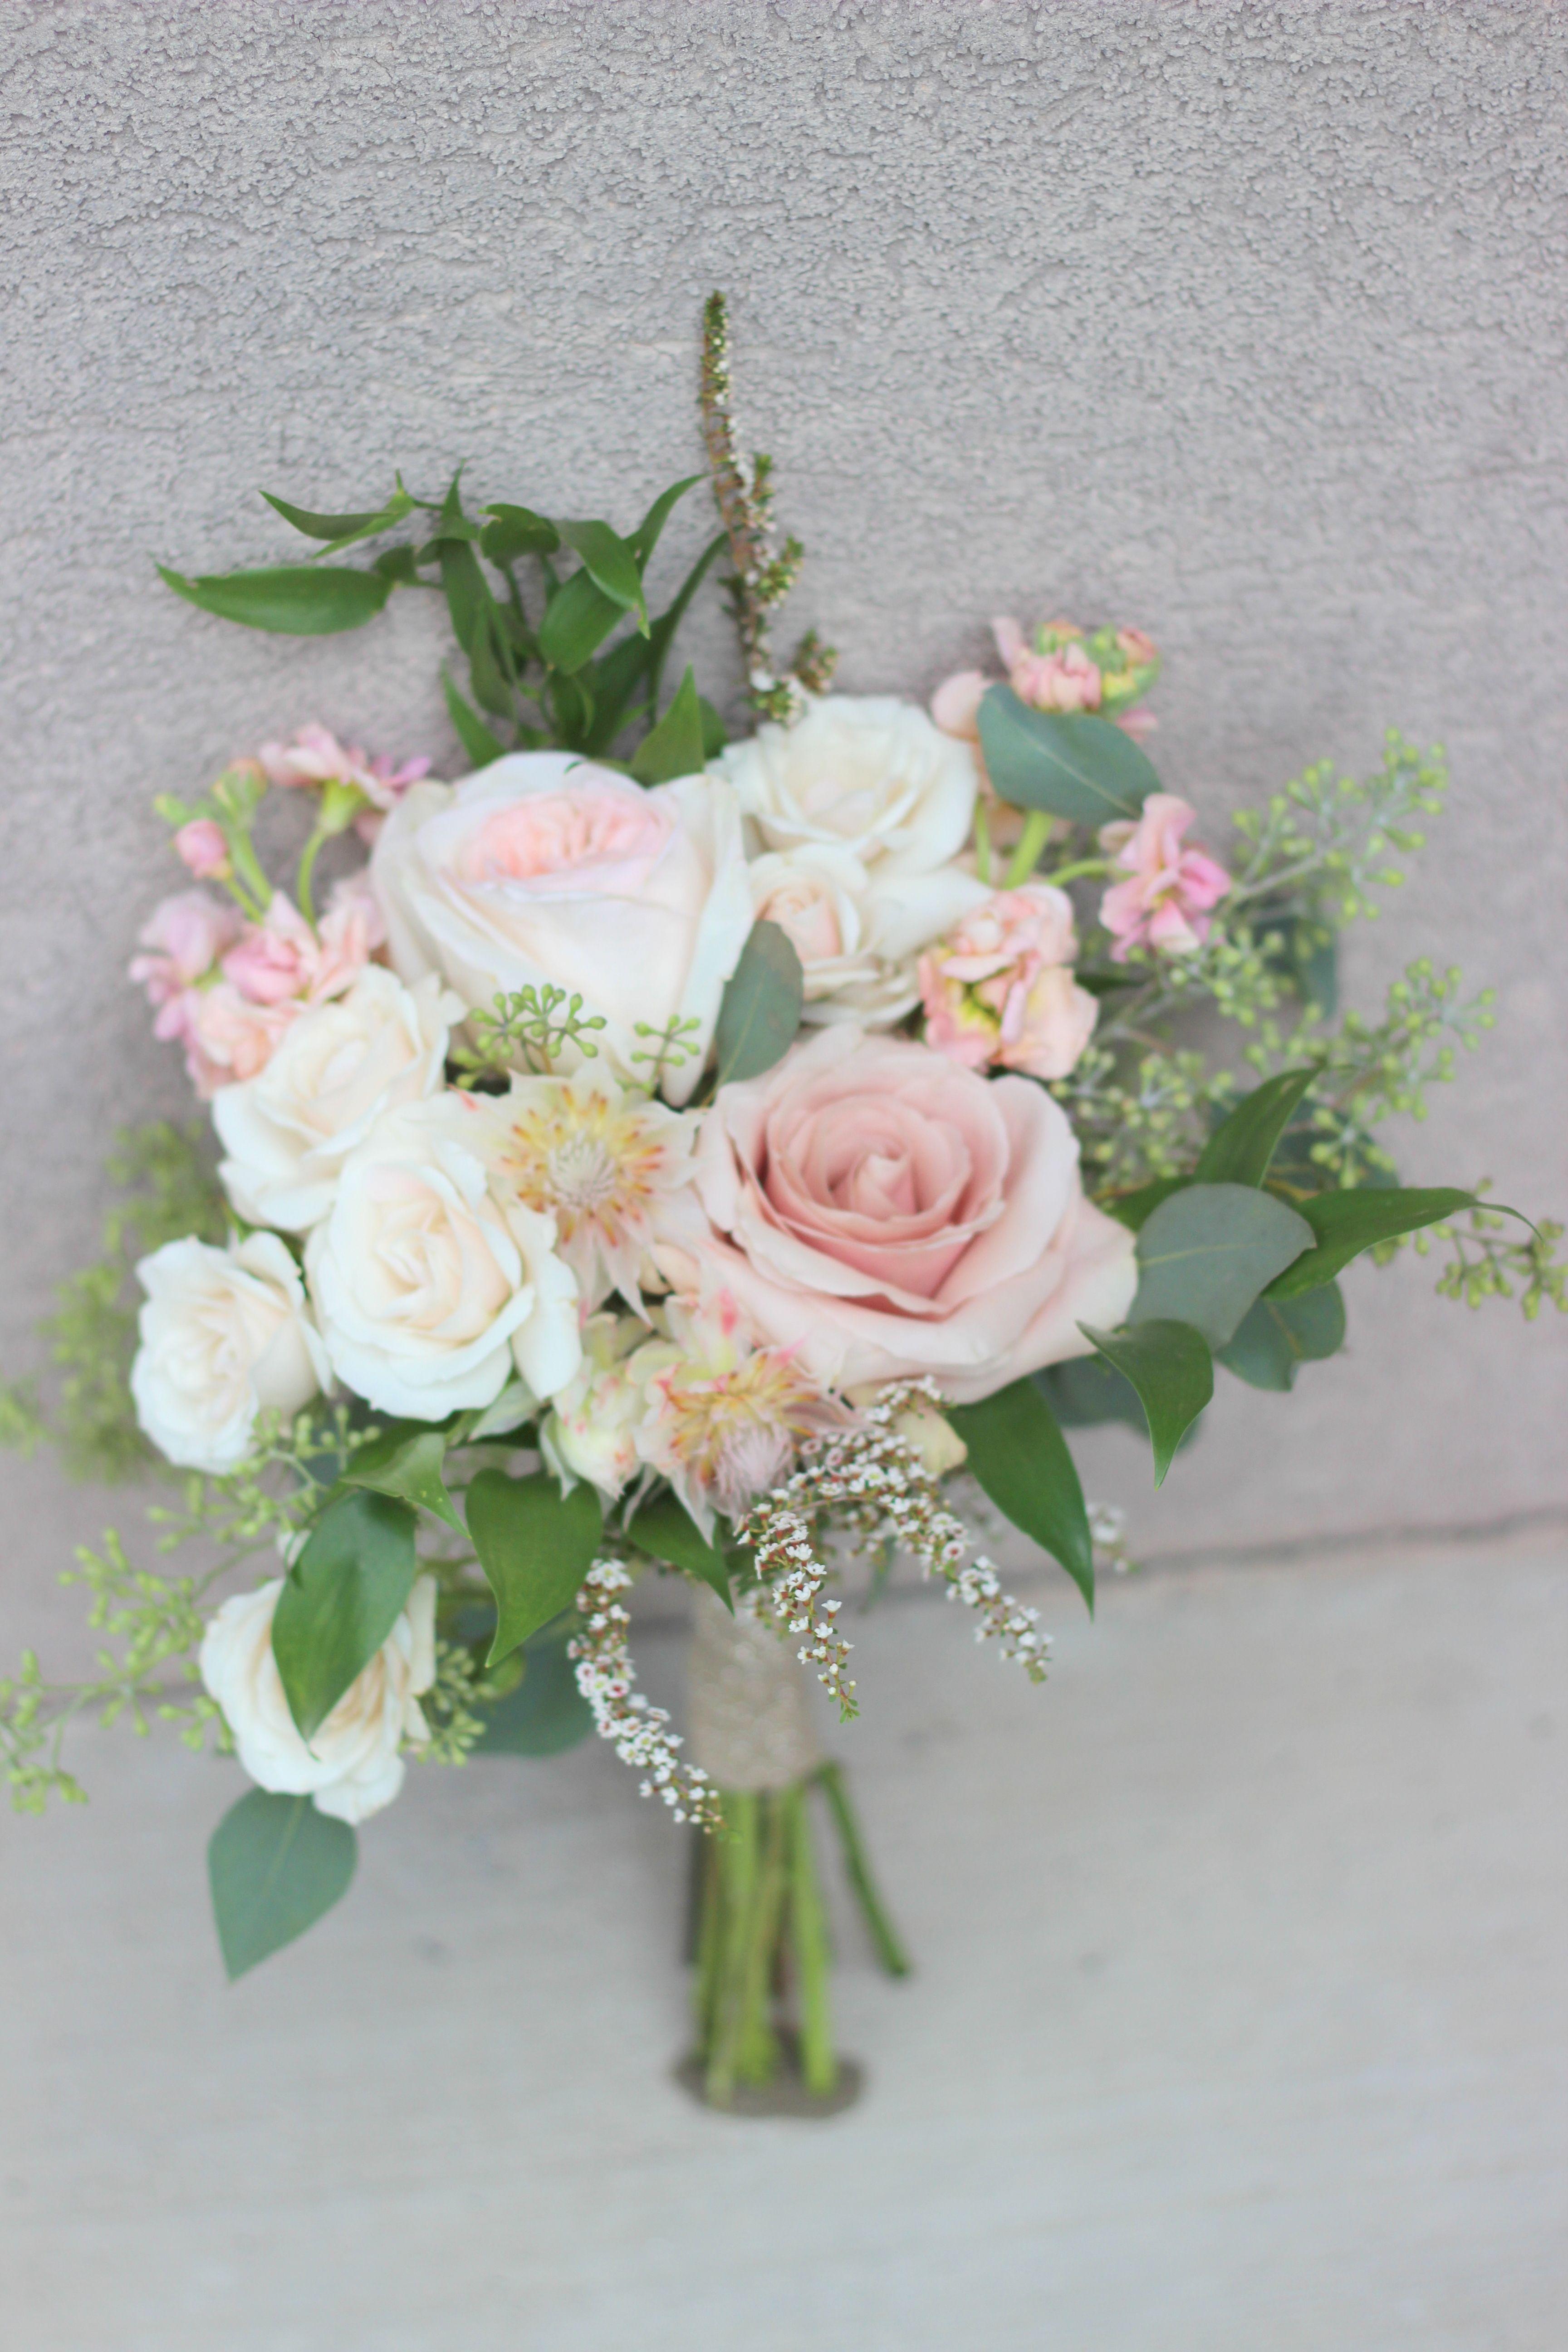 Blush Bridesmaids Bouquet Blush Stock Quicksand Rose White